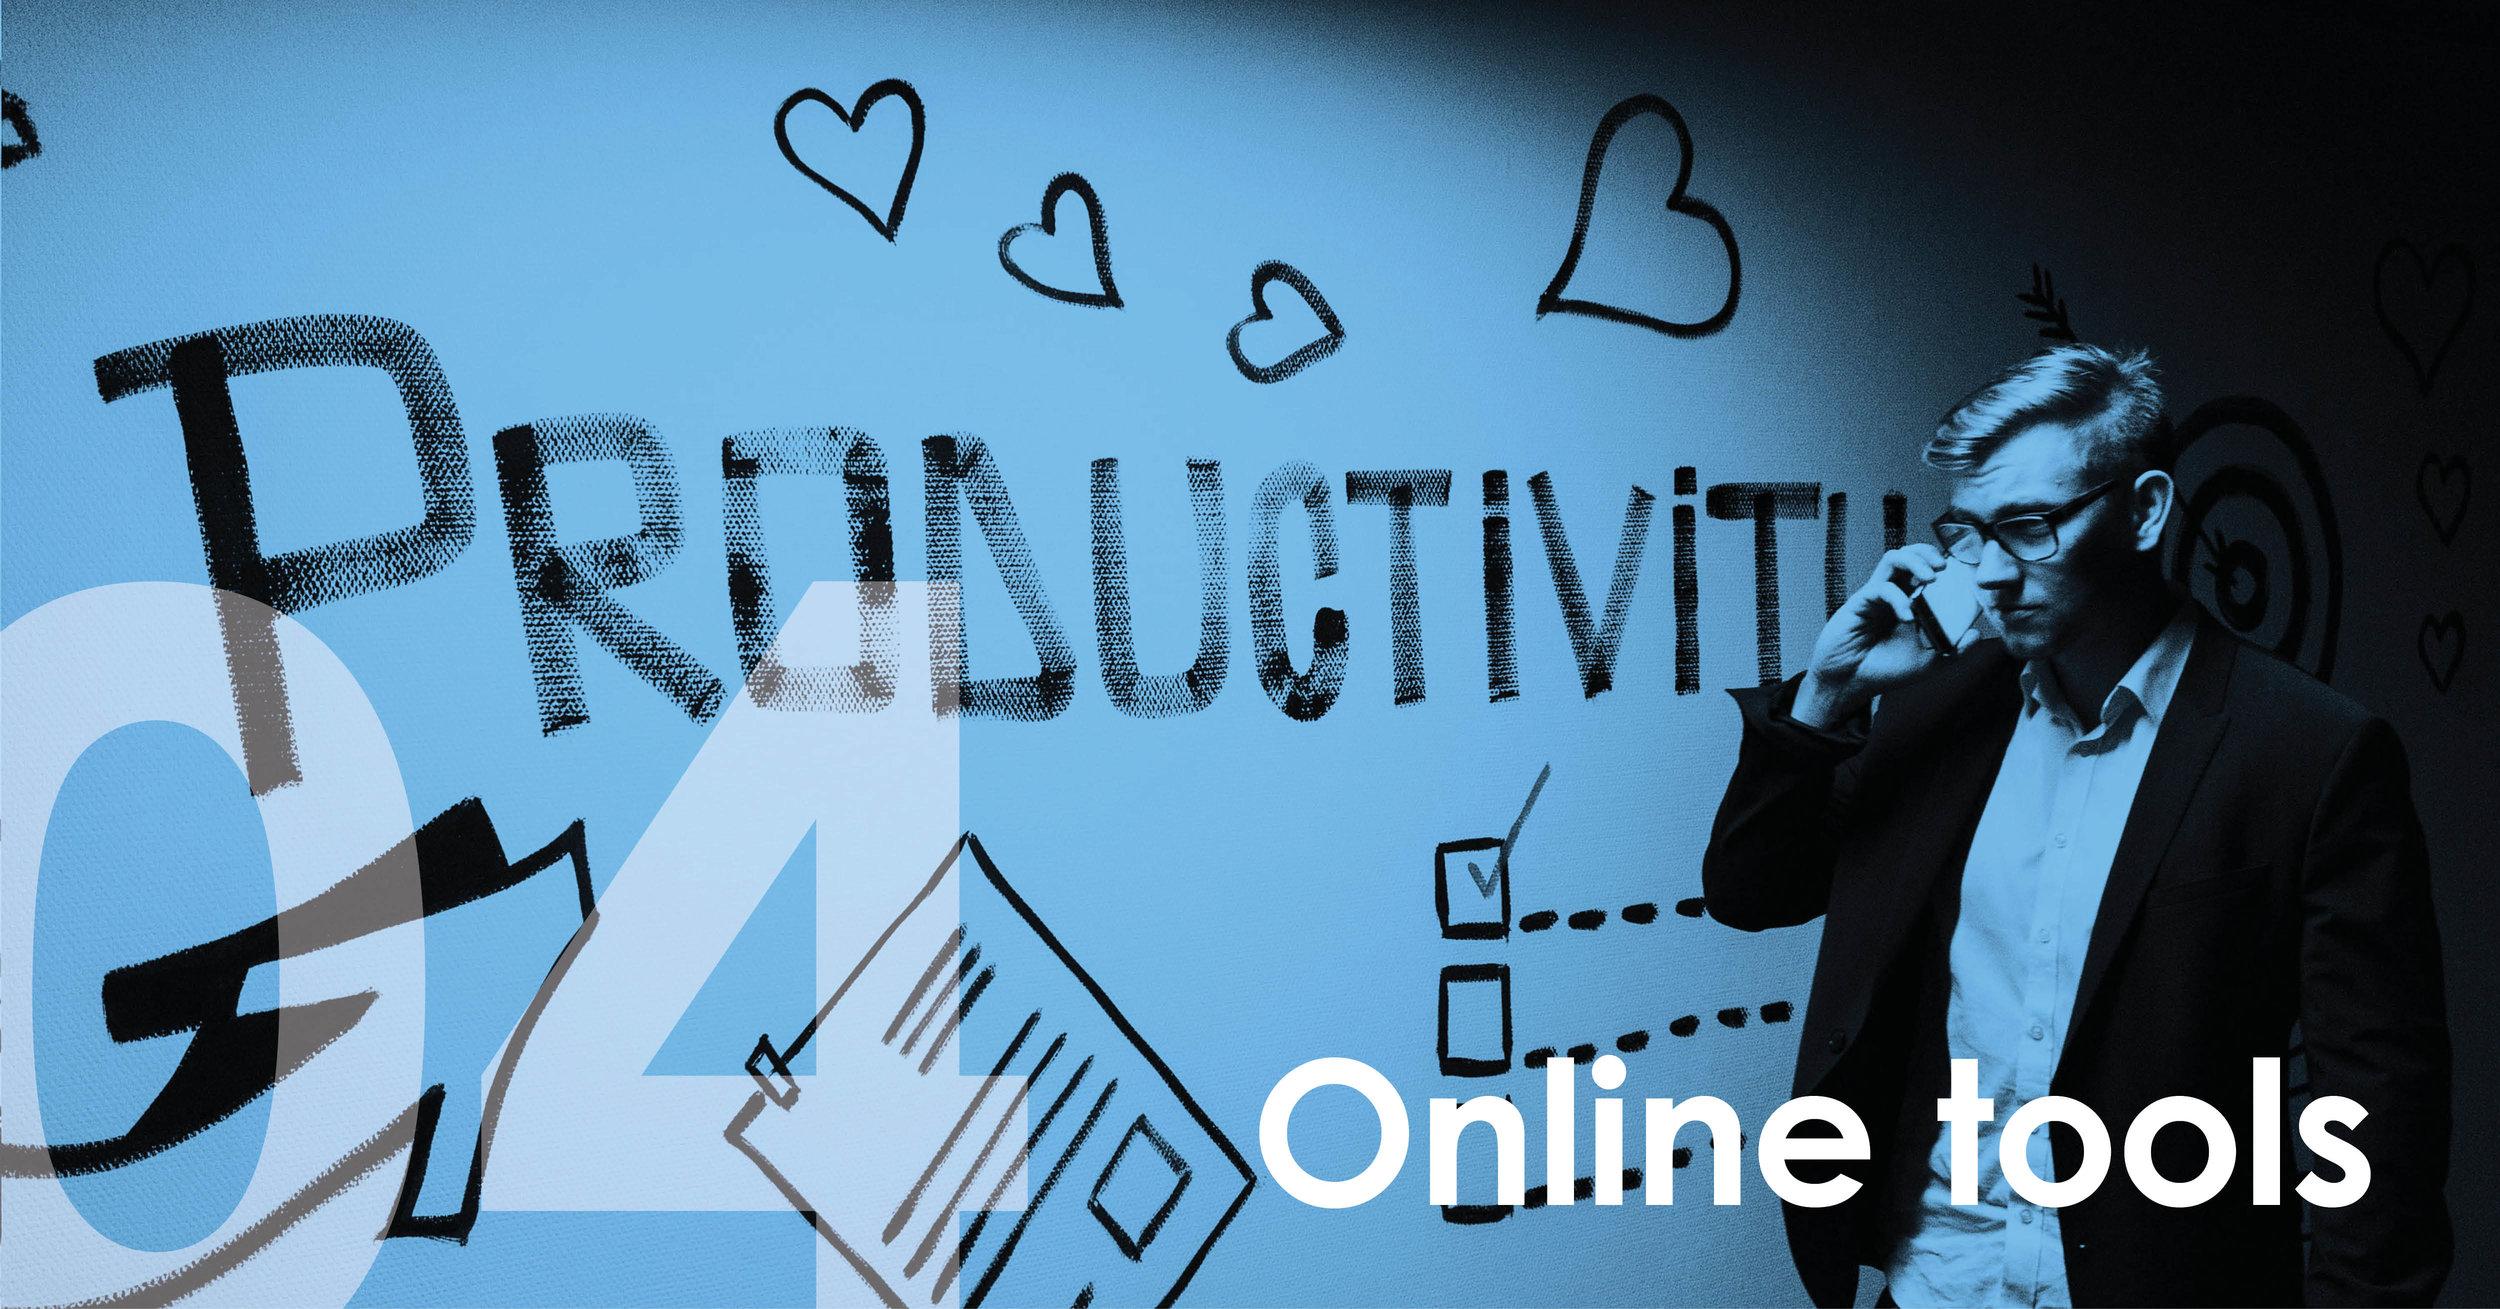 04. Online tools